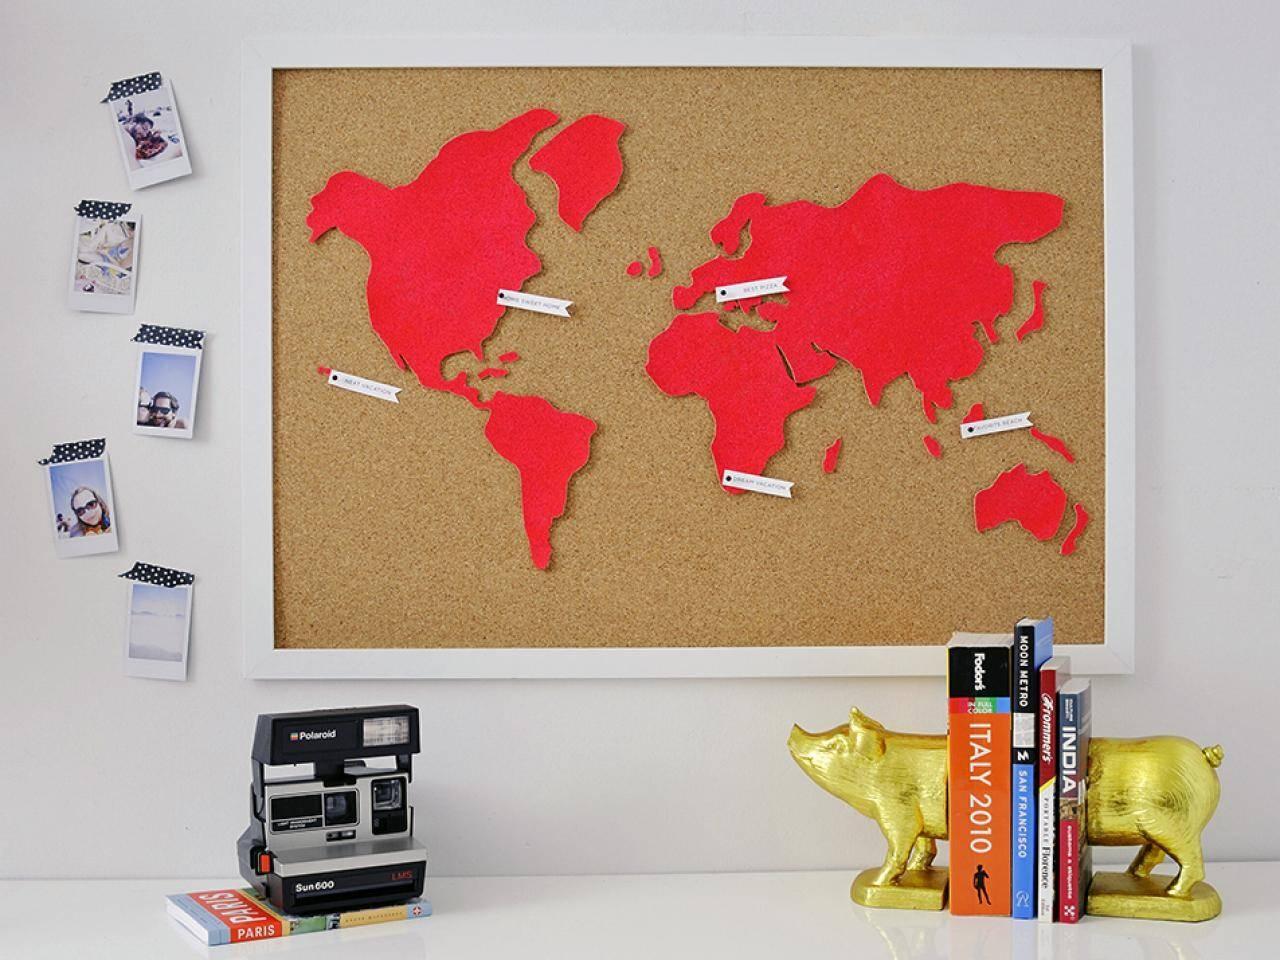 Diy Wall Art: Make A Custom Corkboard World Map | Hgtv In Recent Custom Map Wall Art (View 9 of 20)